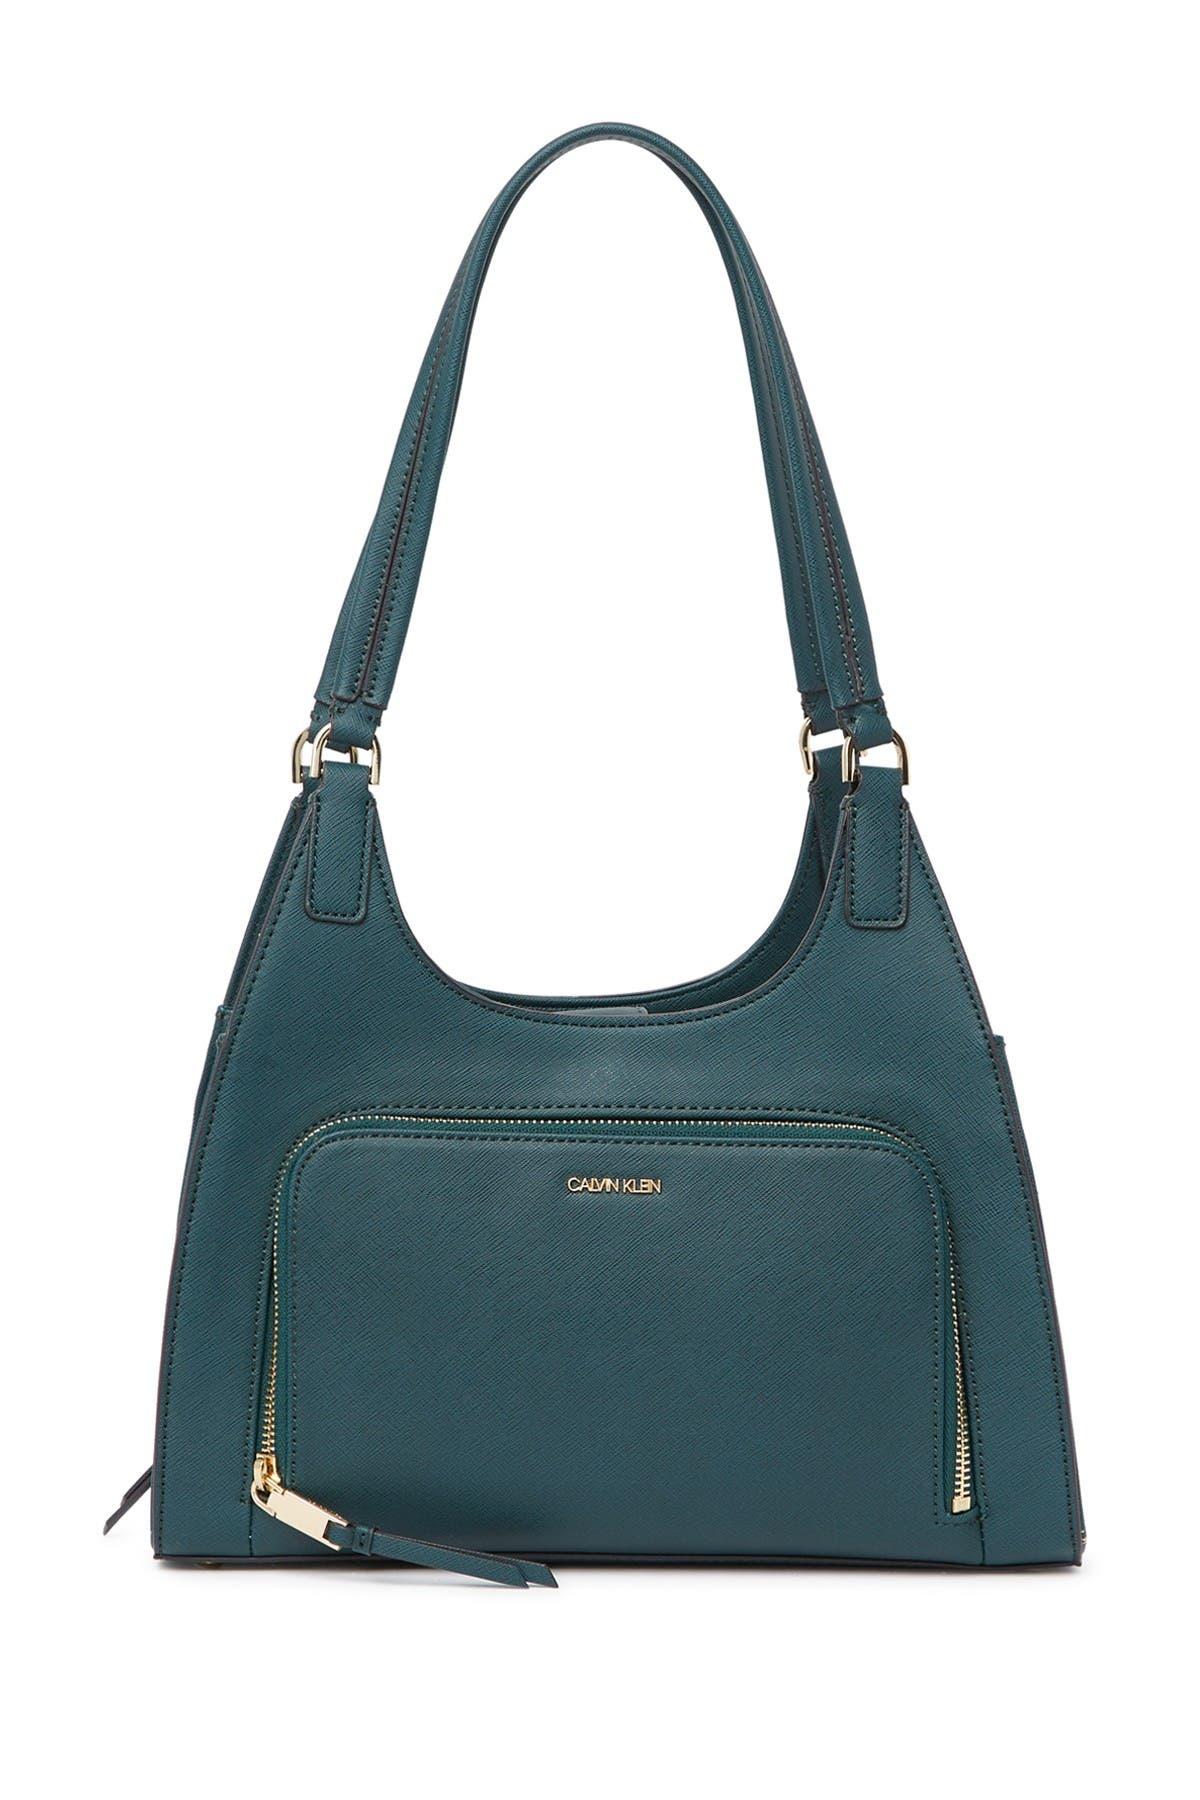 Image of Calvin Klein Ava Saffiano Leather Organizational Shoulder Bag